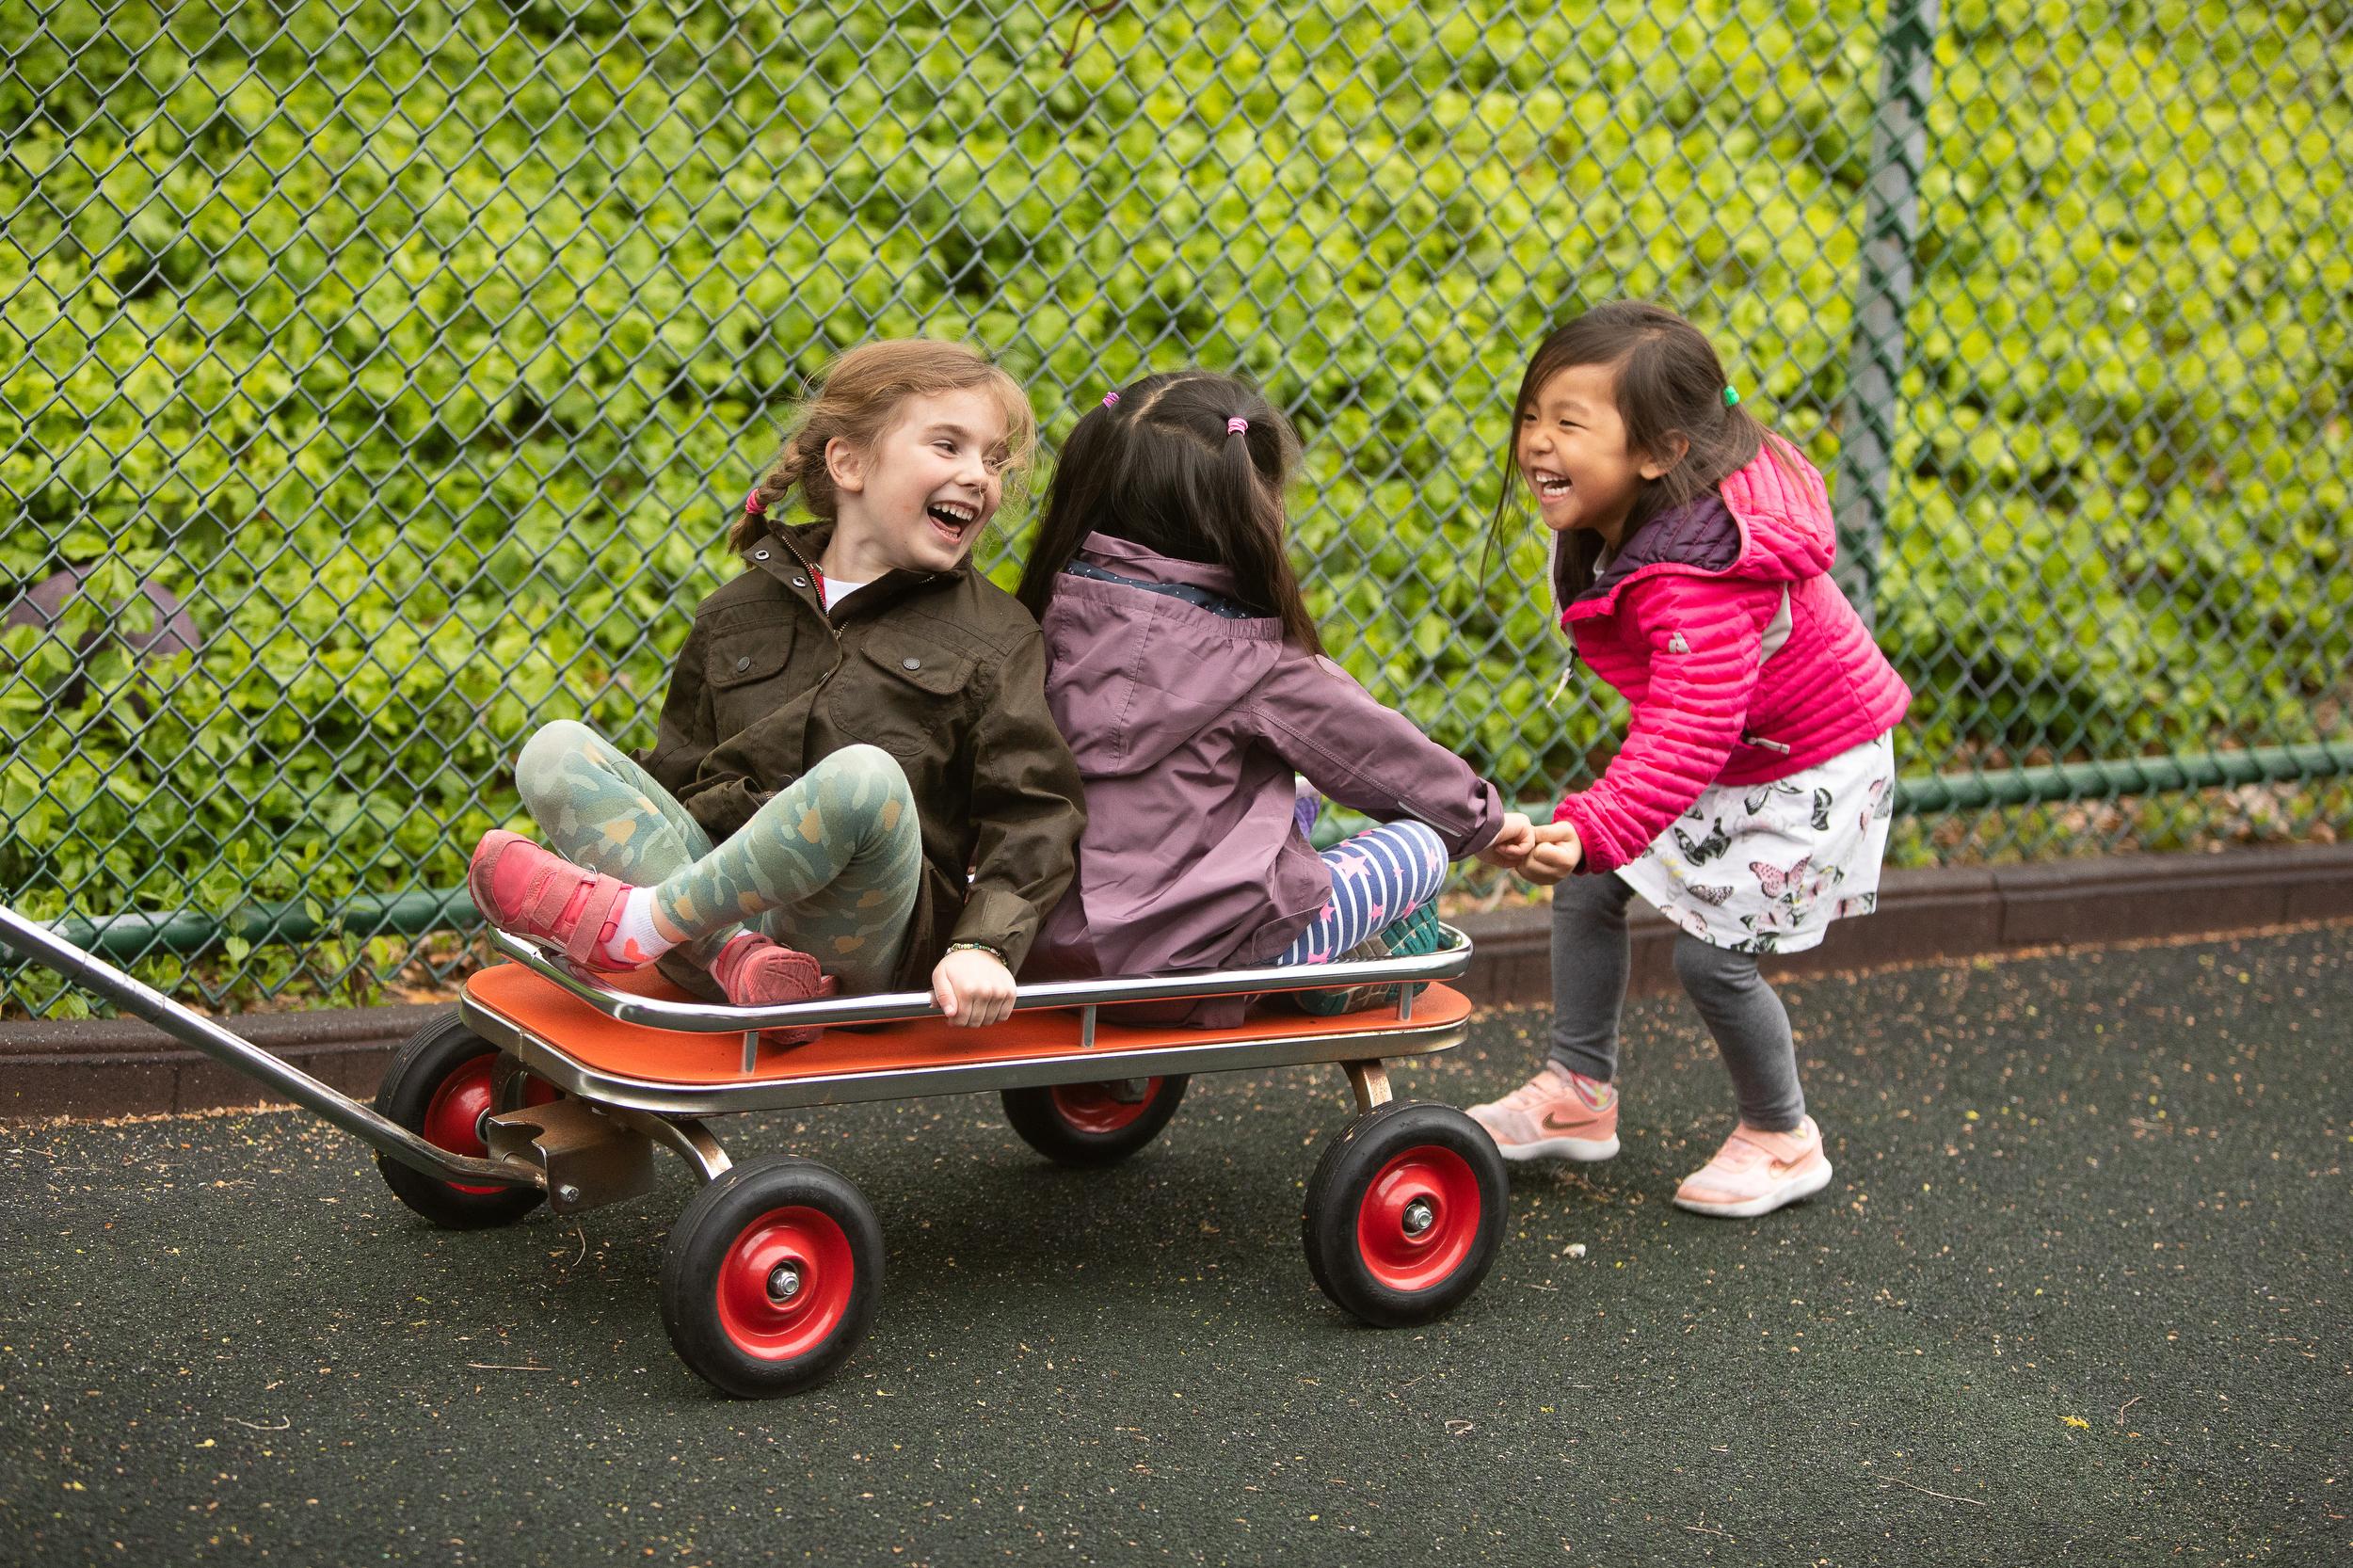 Students play in a school yard